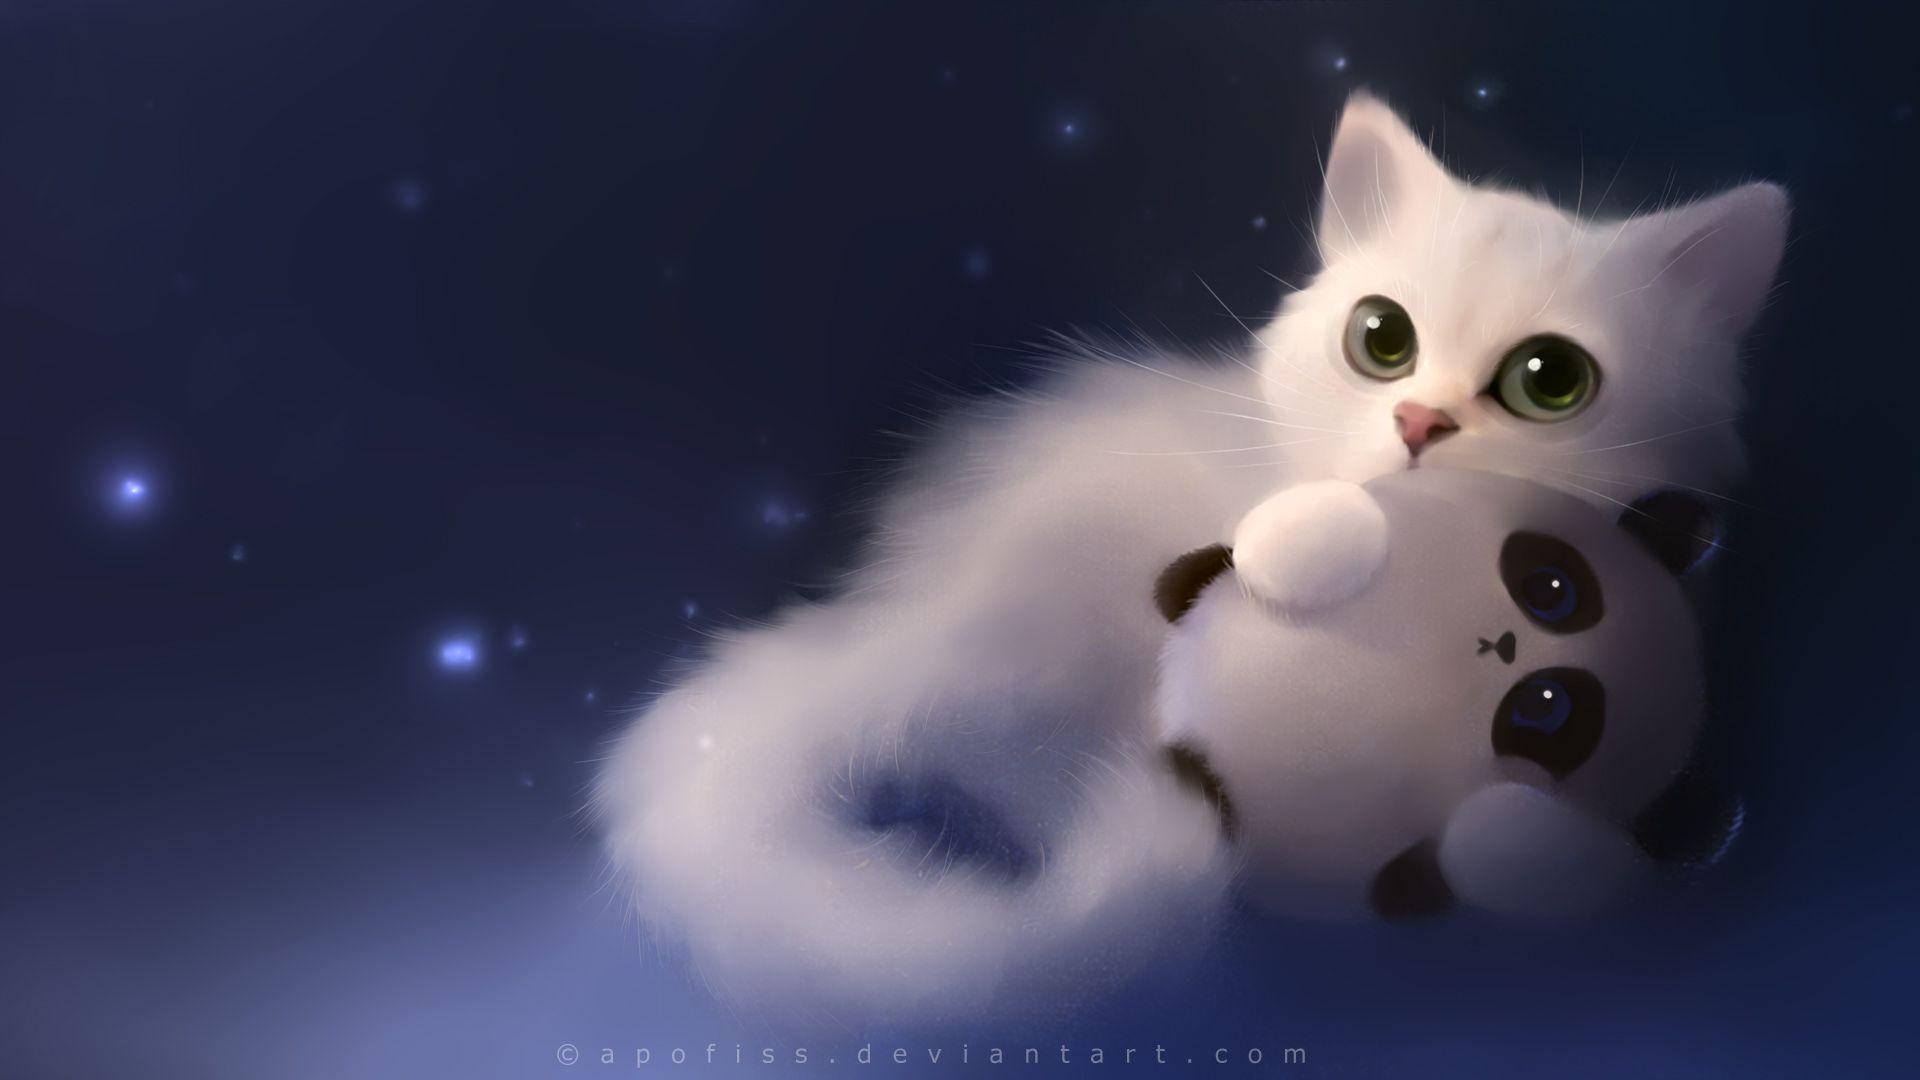 Animated Cat Desktop Wallpapers Top Free Animated Cat Desktop Backgrounds Wallpaperaccess